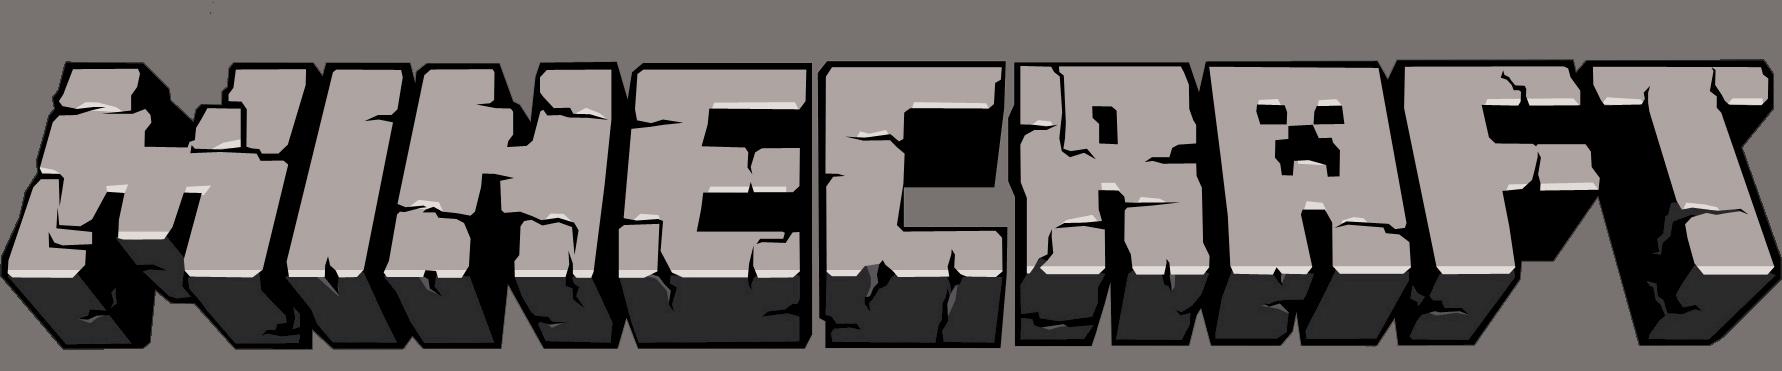 image-logo-minecraft